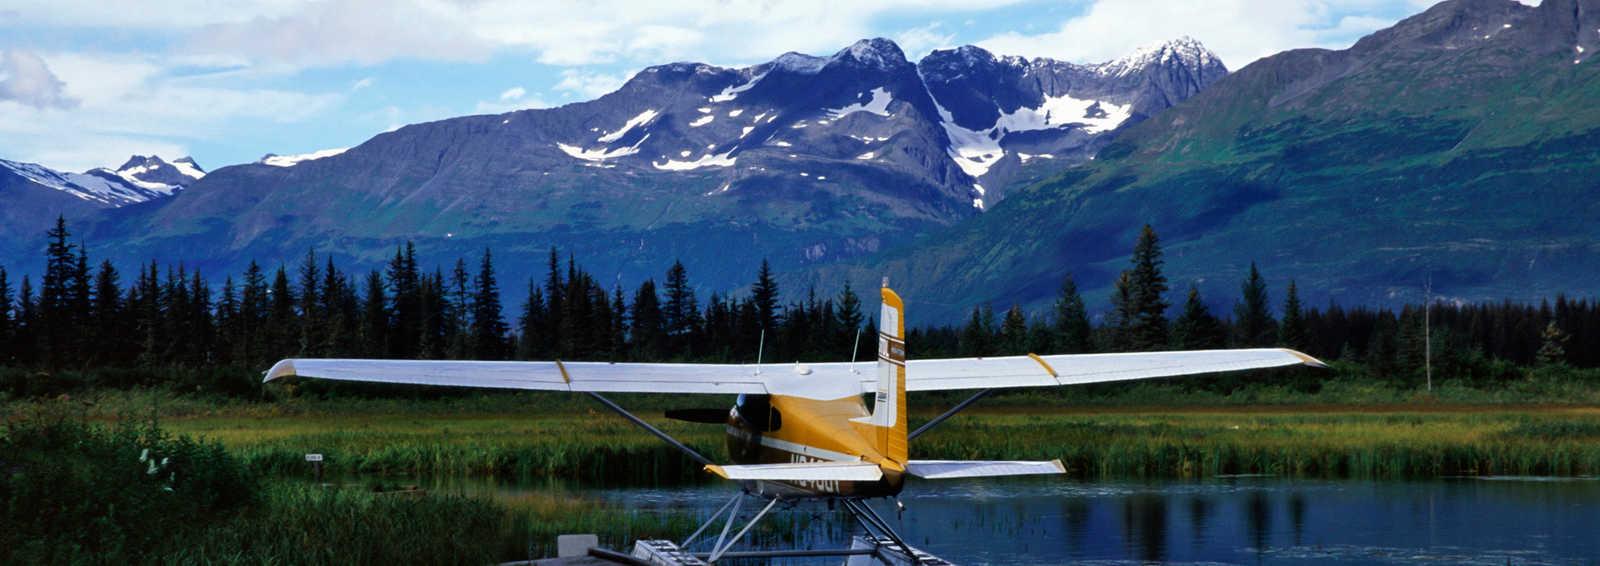 Seaplane, Alaska